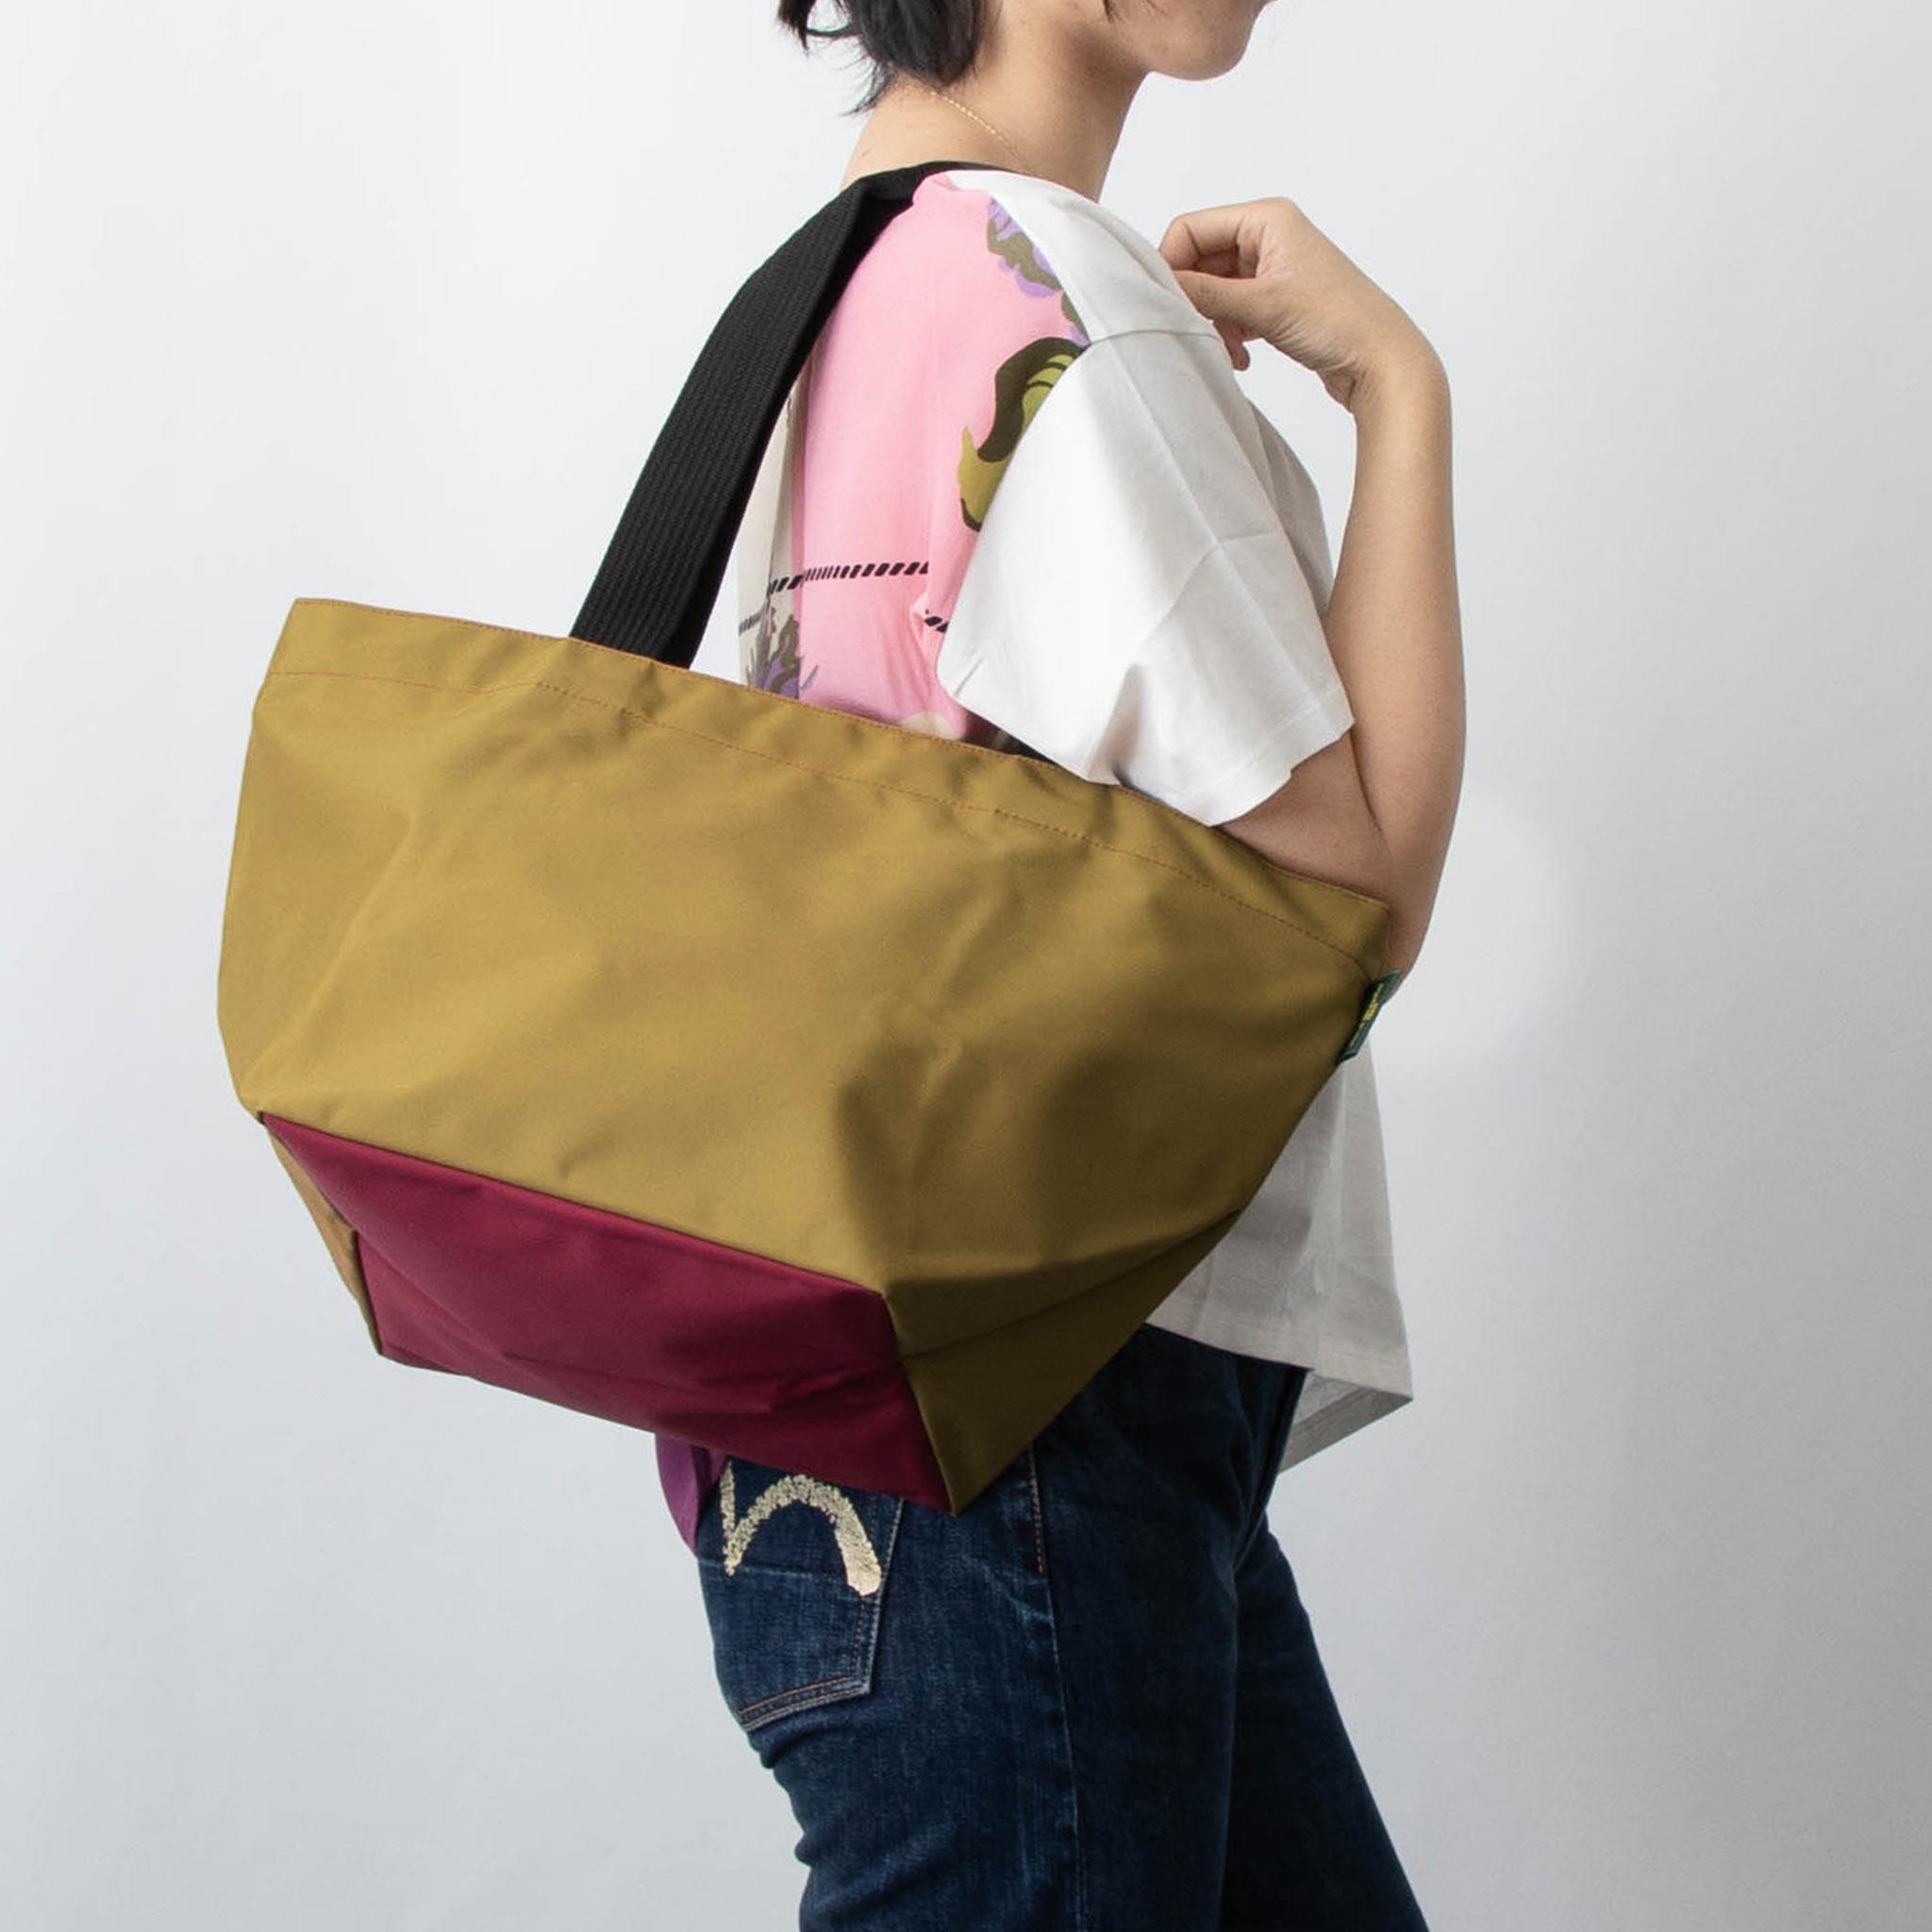 Erbeshaprie Herve Chapelier-boat tote bags L Le for CABAS BAG 925N [all colors]